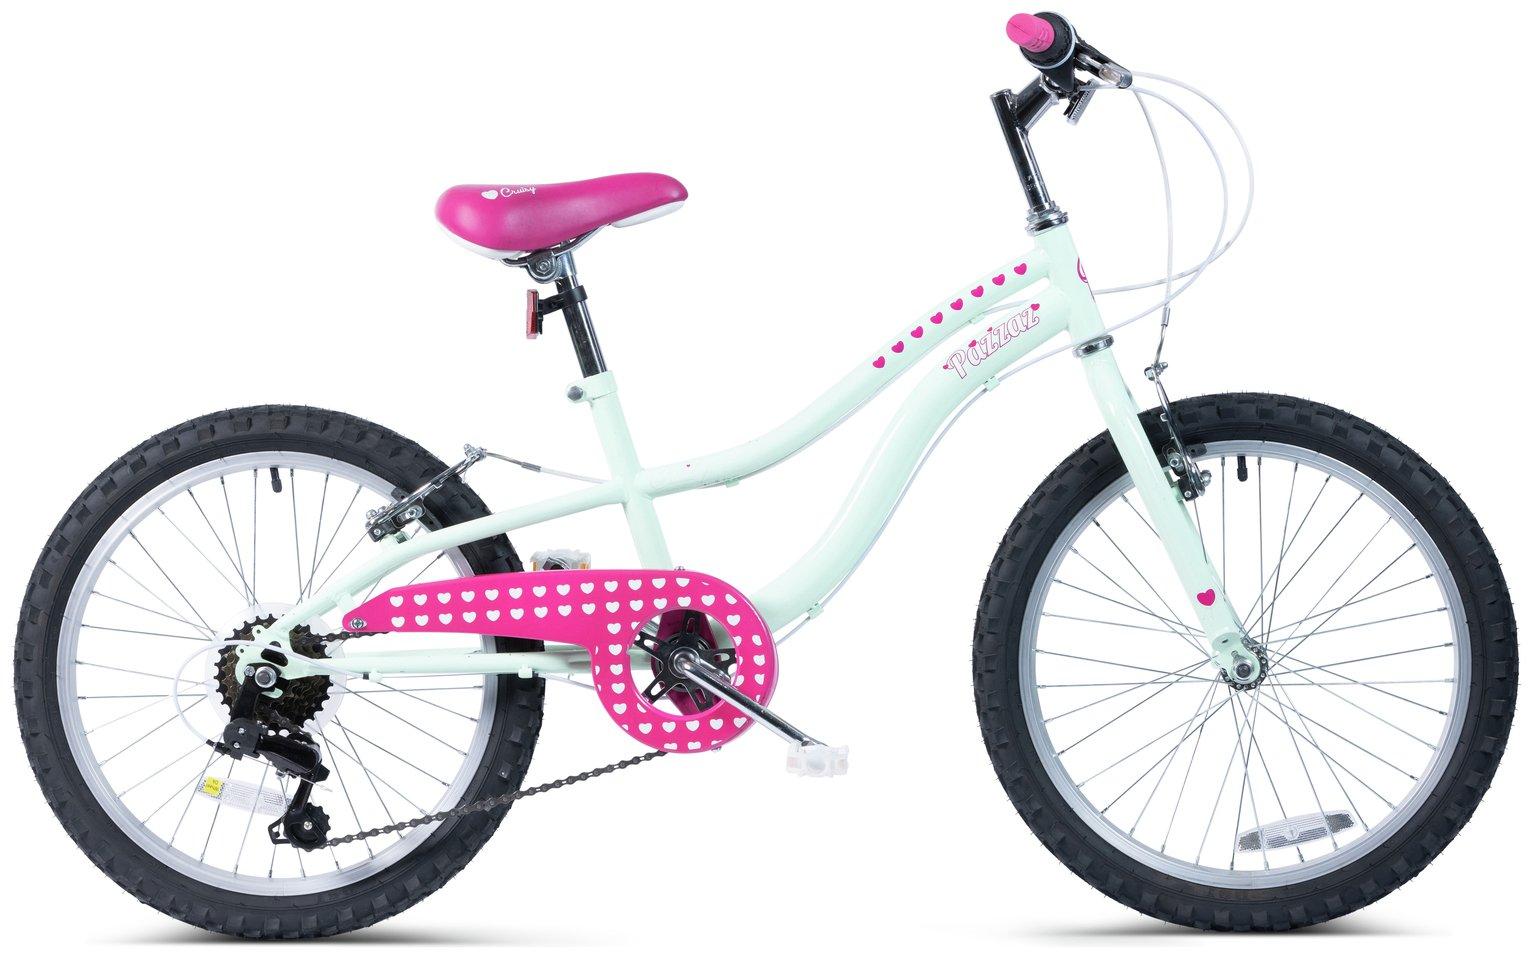 Pazzaz 20 Inch Cruisy Junior Bike